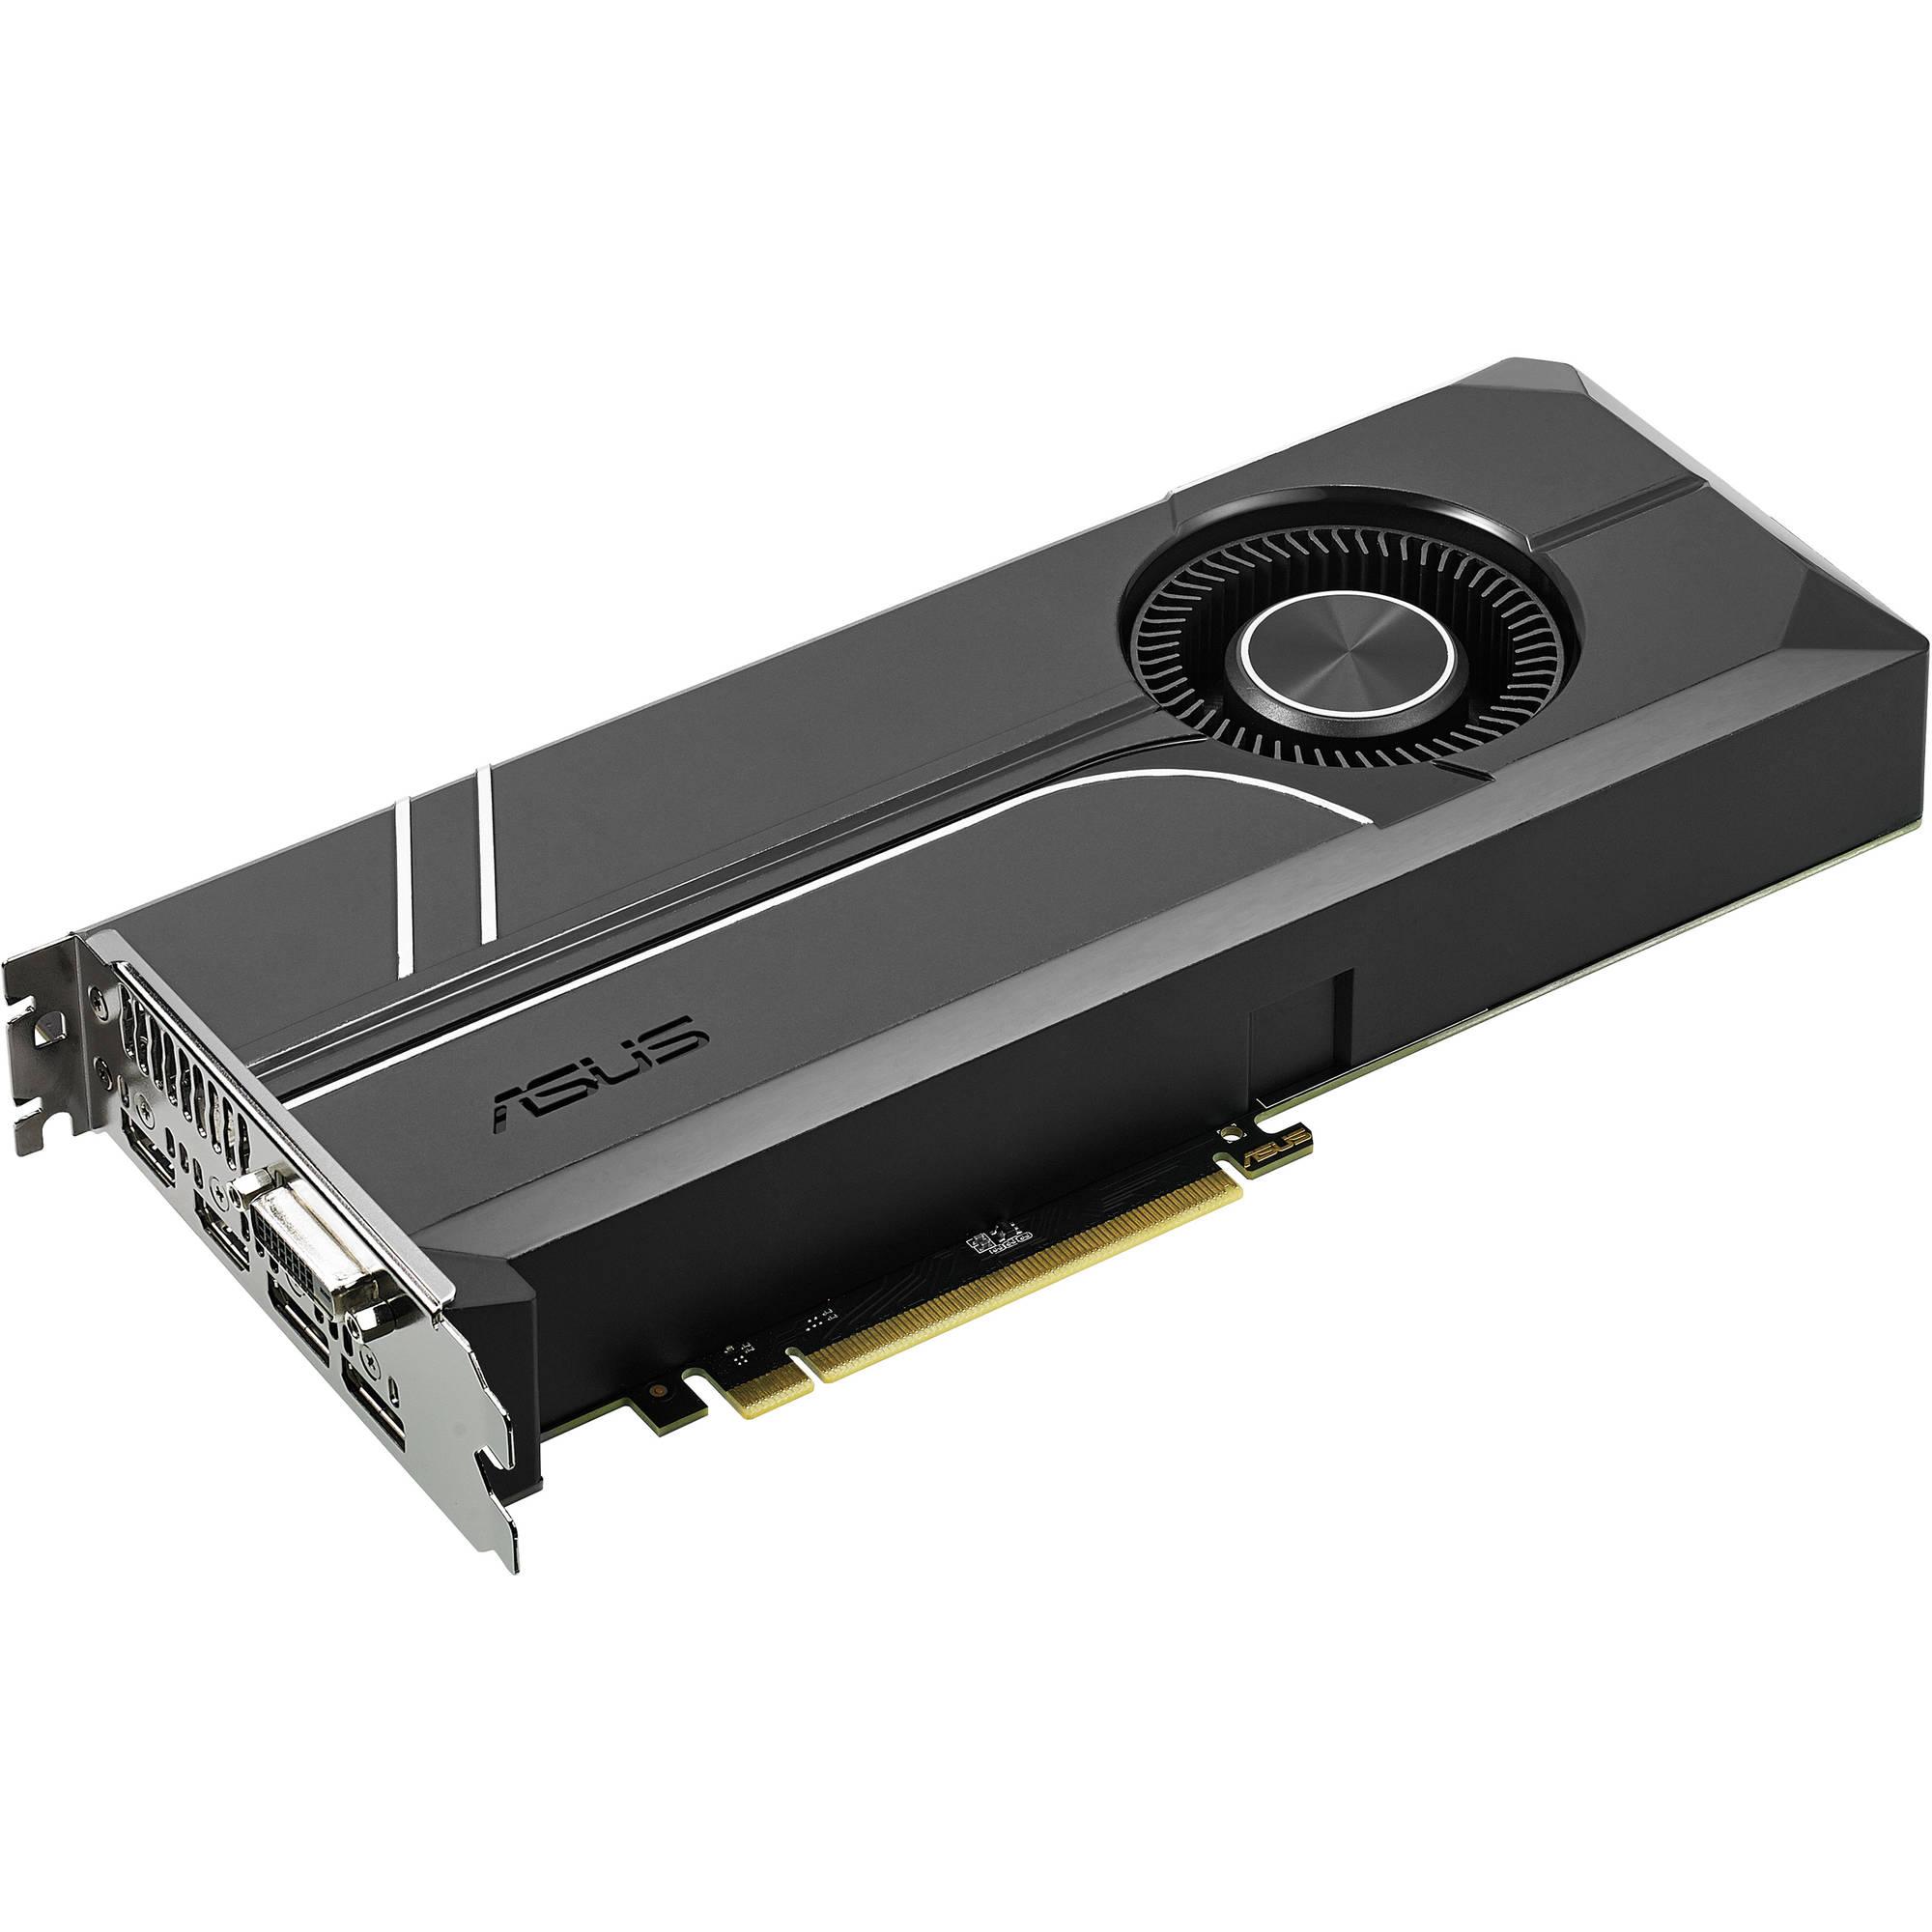 ASUS Turbo GeForce GTX 1060 Graphics Card